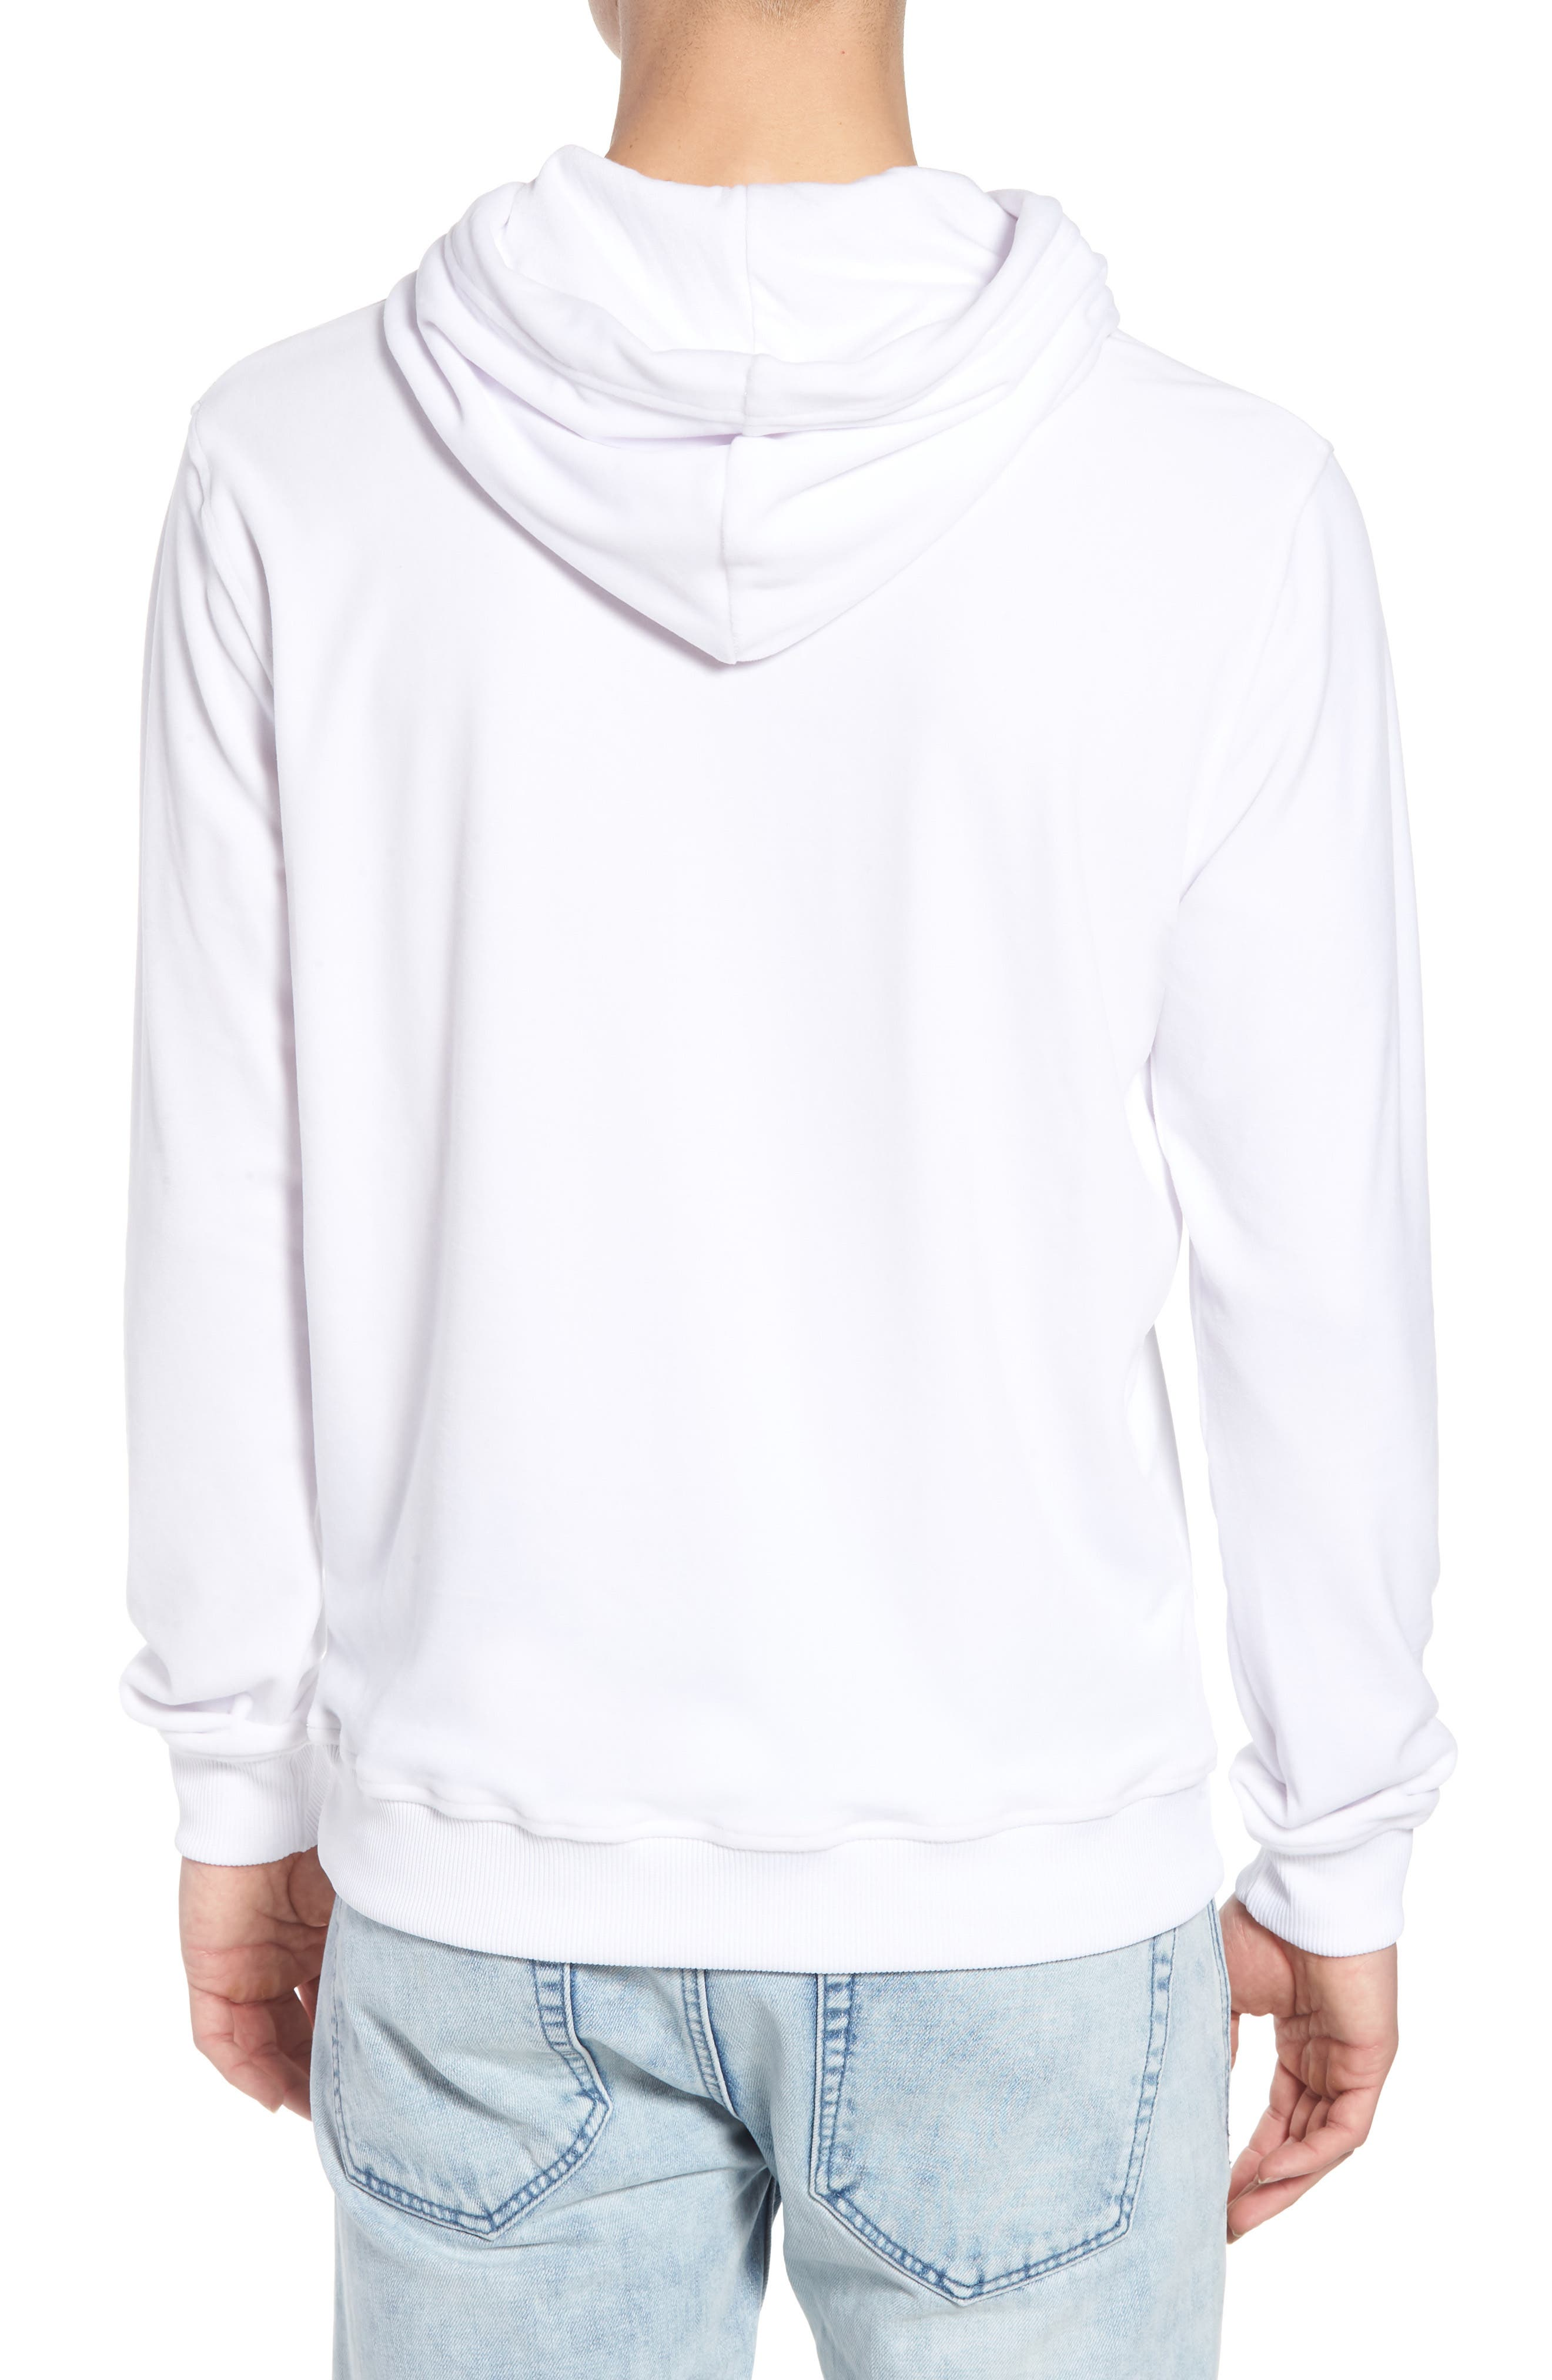 Asher Velour Hoodie Sweatshirt,                             Alternate thumbnail 2, color,                             100